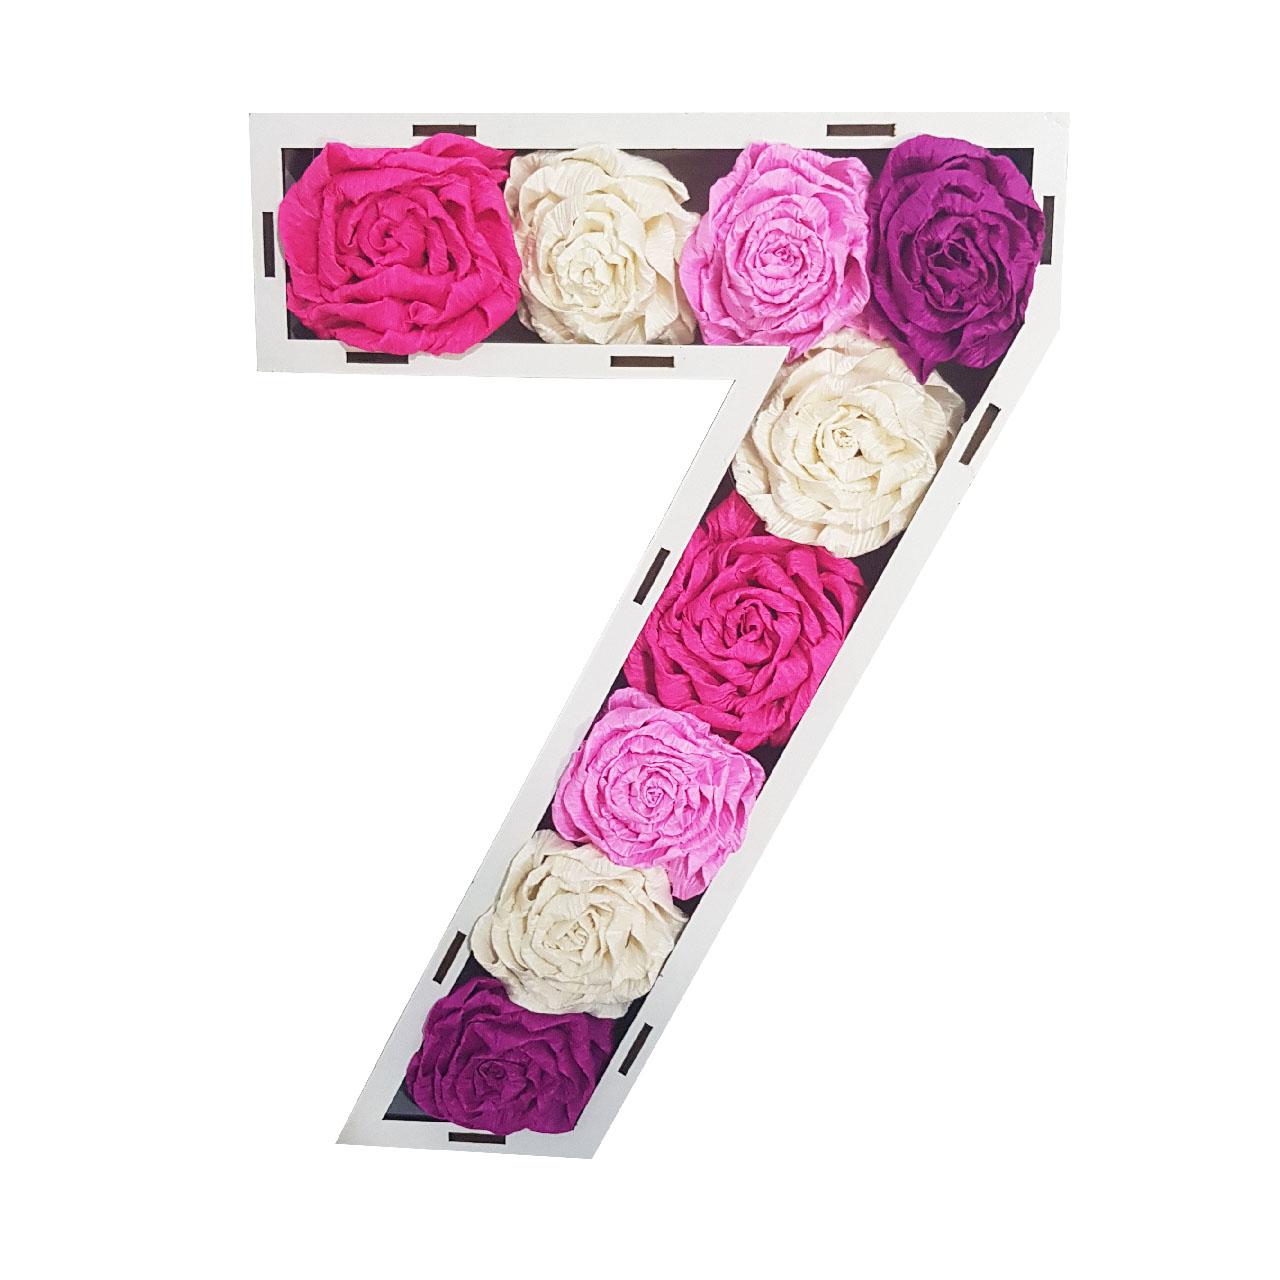 استند گل مصنوعی طرح عدد 7 کد 759